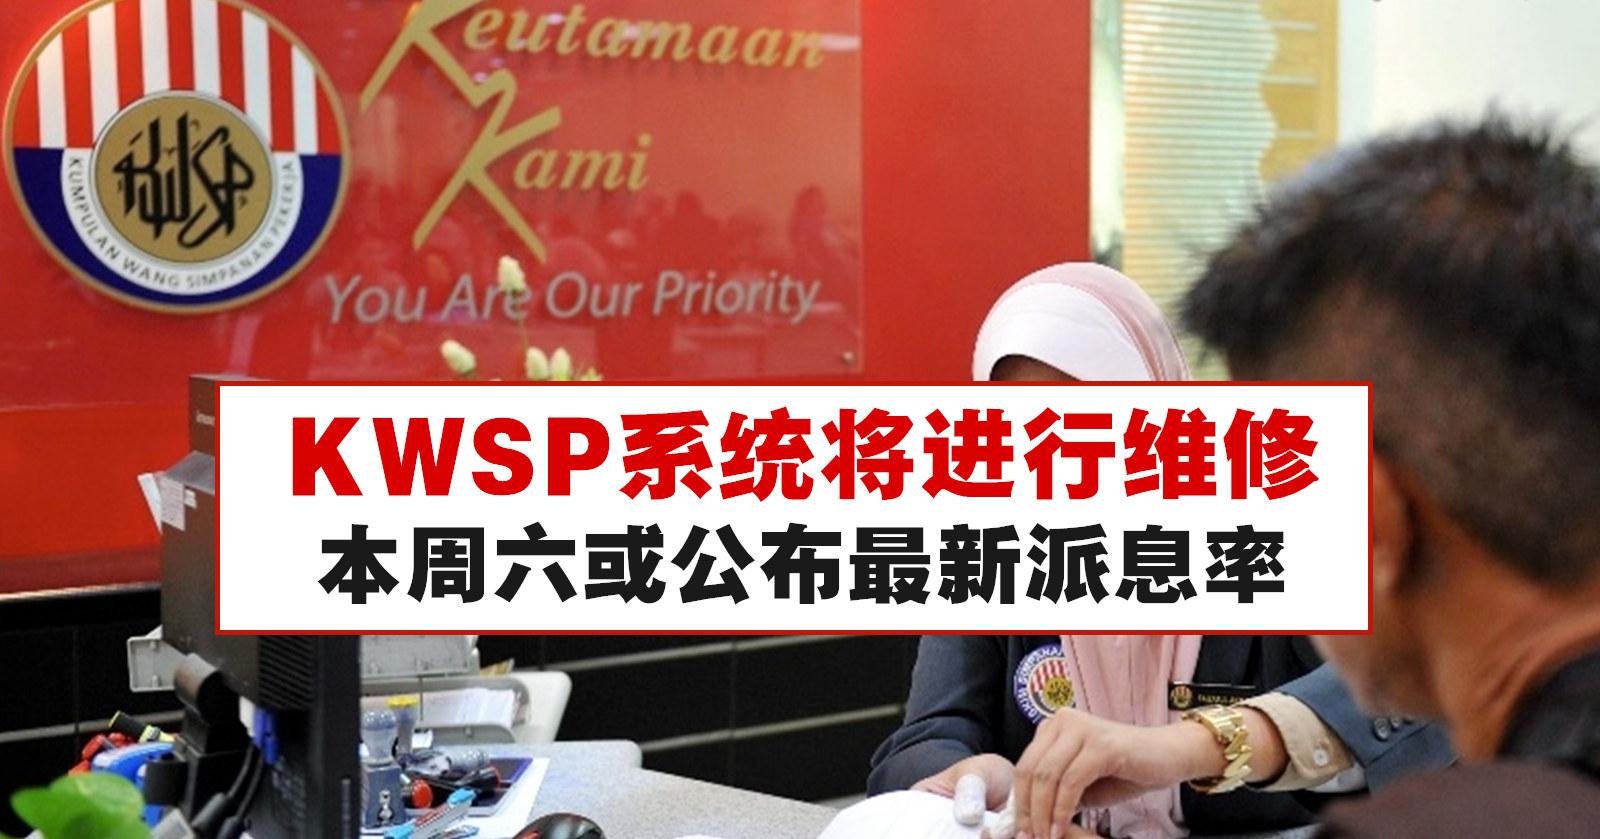 KWSP宣布:2月21日和22日线上系统进行升级和维修!